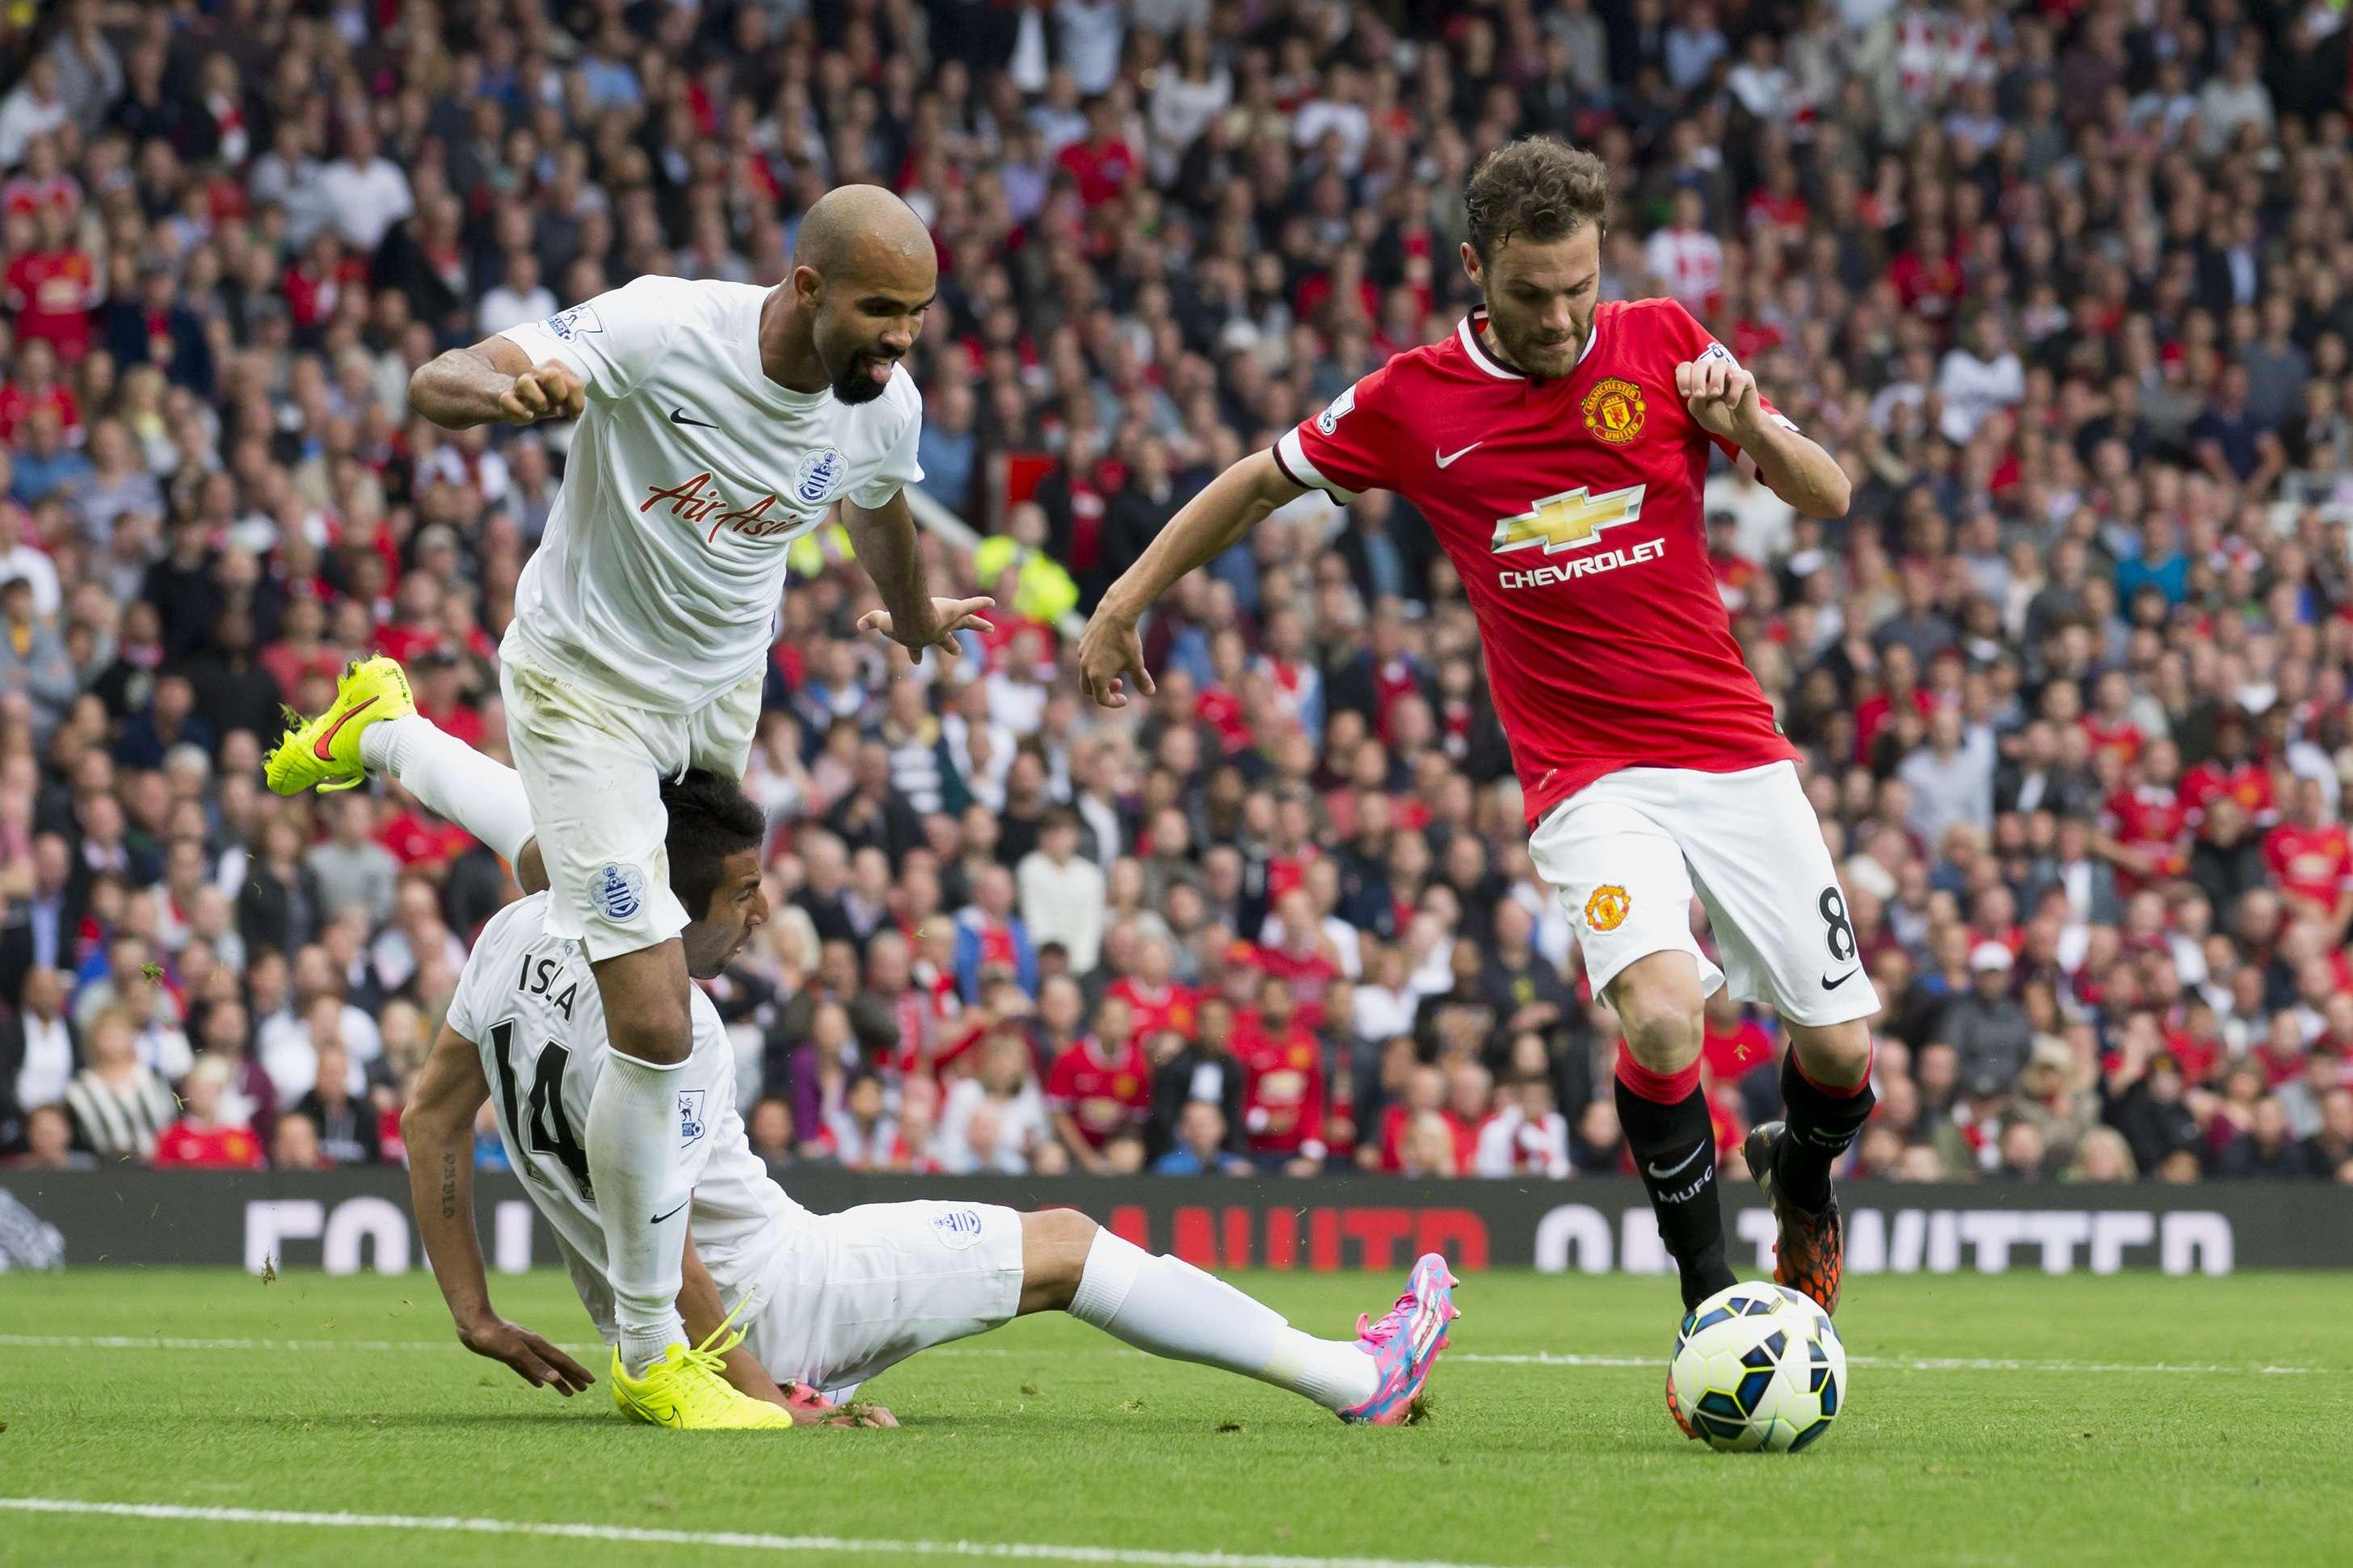 Sandro enfrenta Manchester United pelo Queens Park Rangers; histórico de problemas físicos Foto: Jon Super/AP